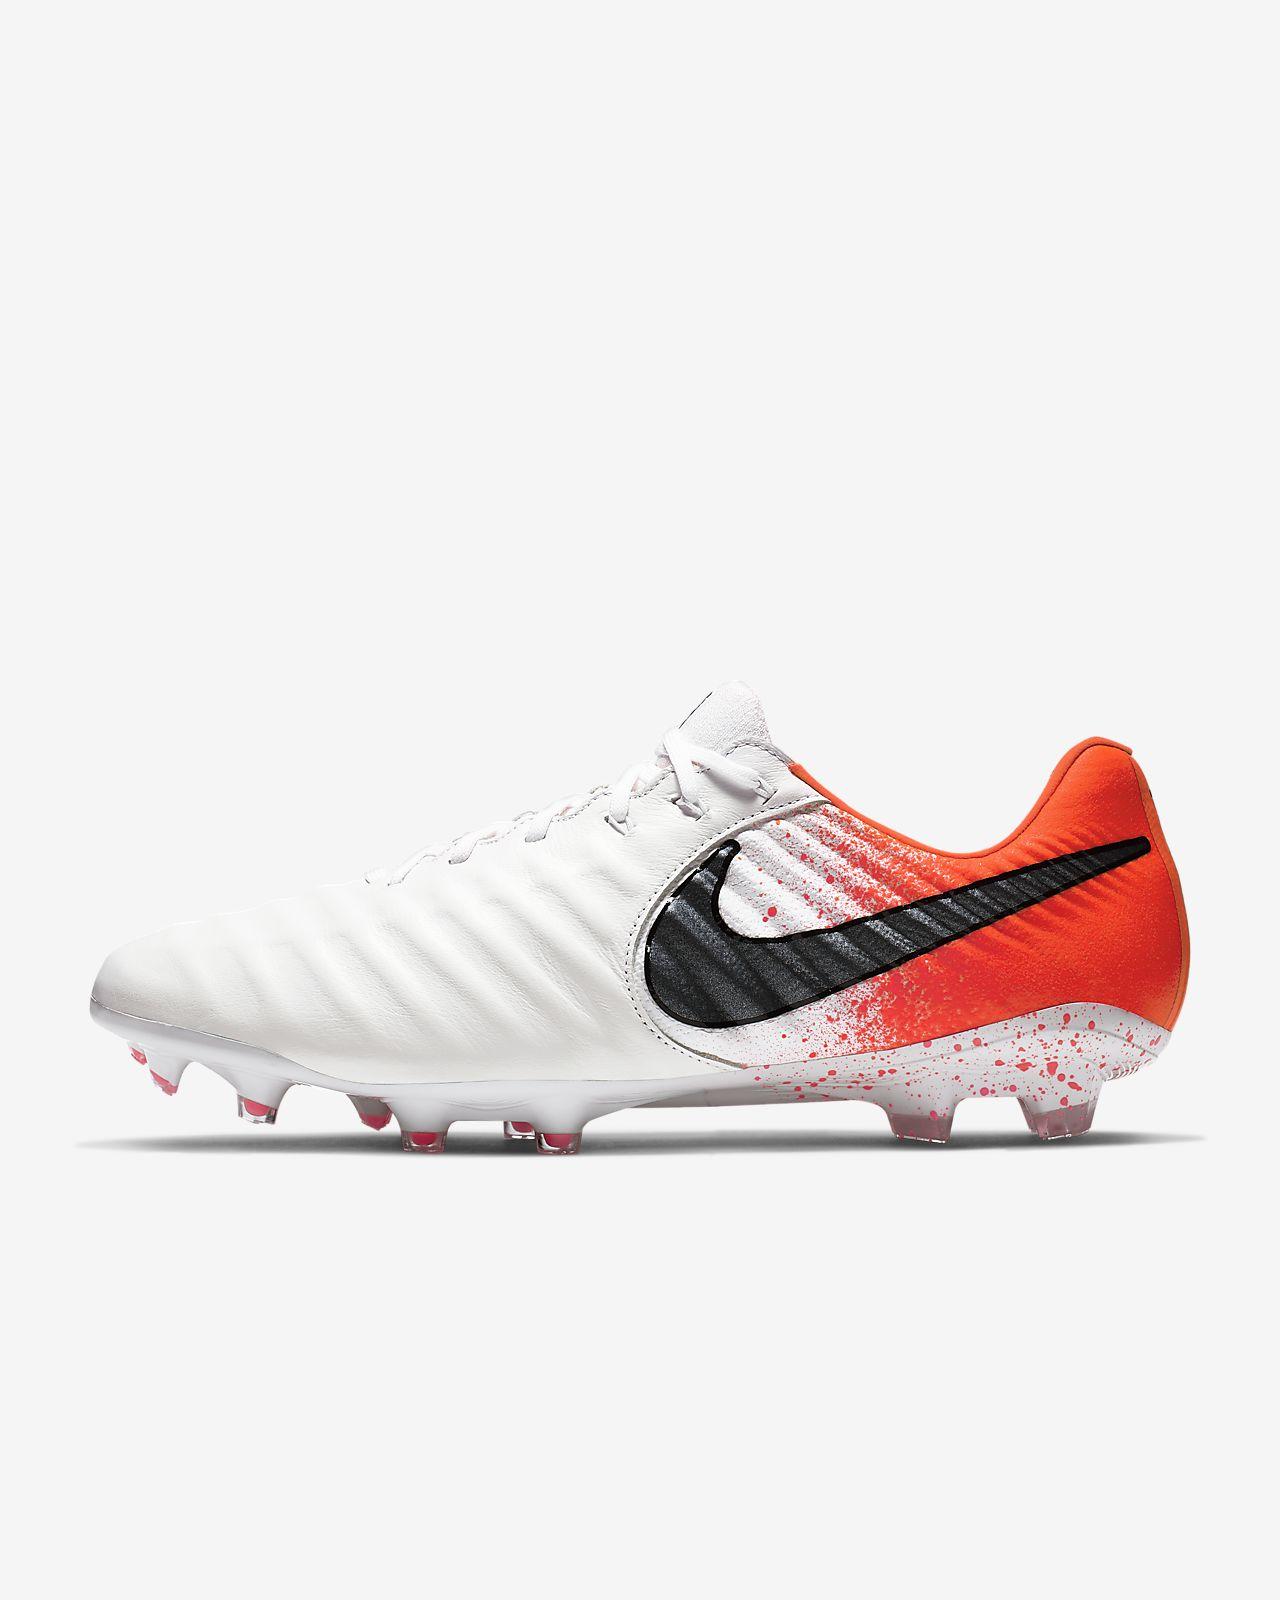 273384519b022 Scarpa da calcio per terreni duri Nike Legend 7 Elite FG. Nike.com IT